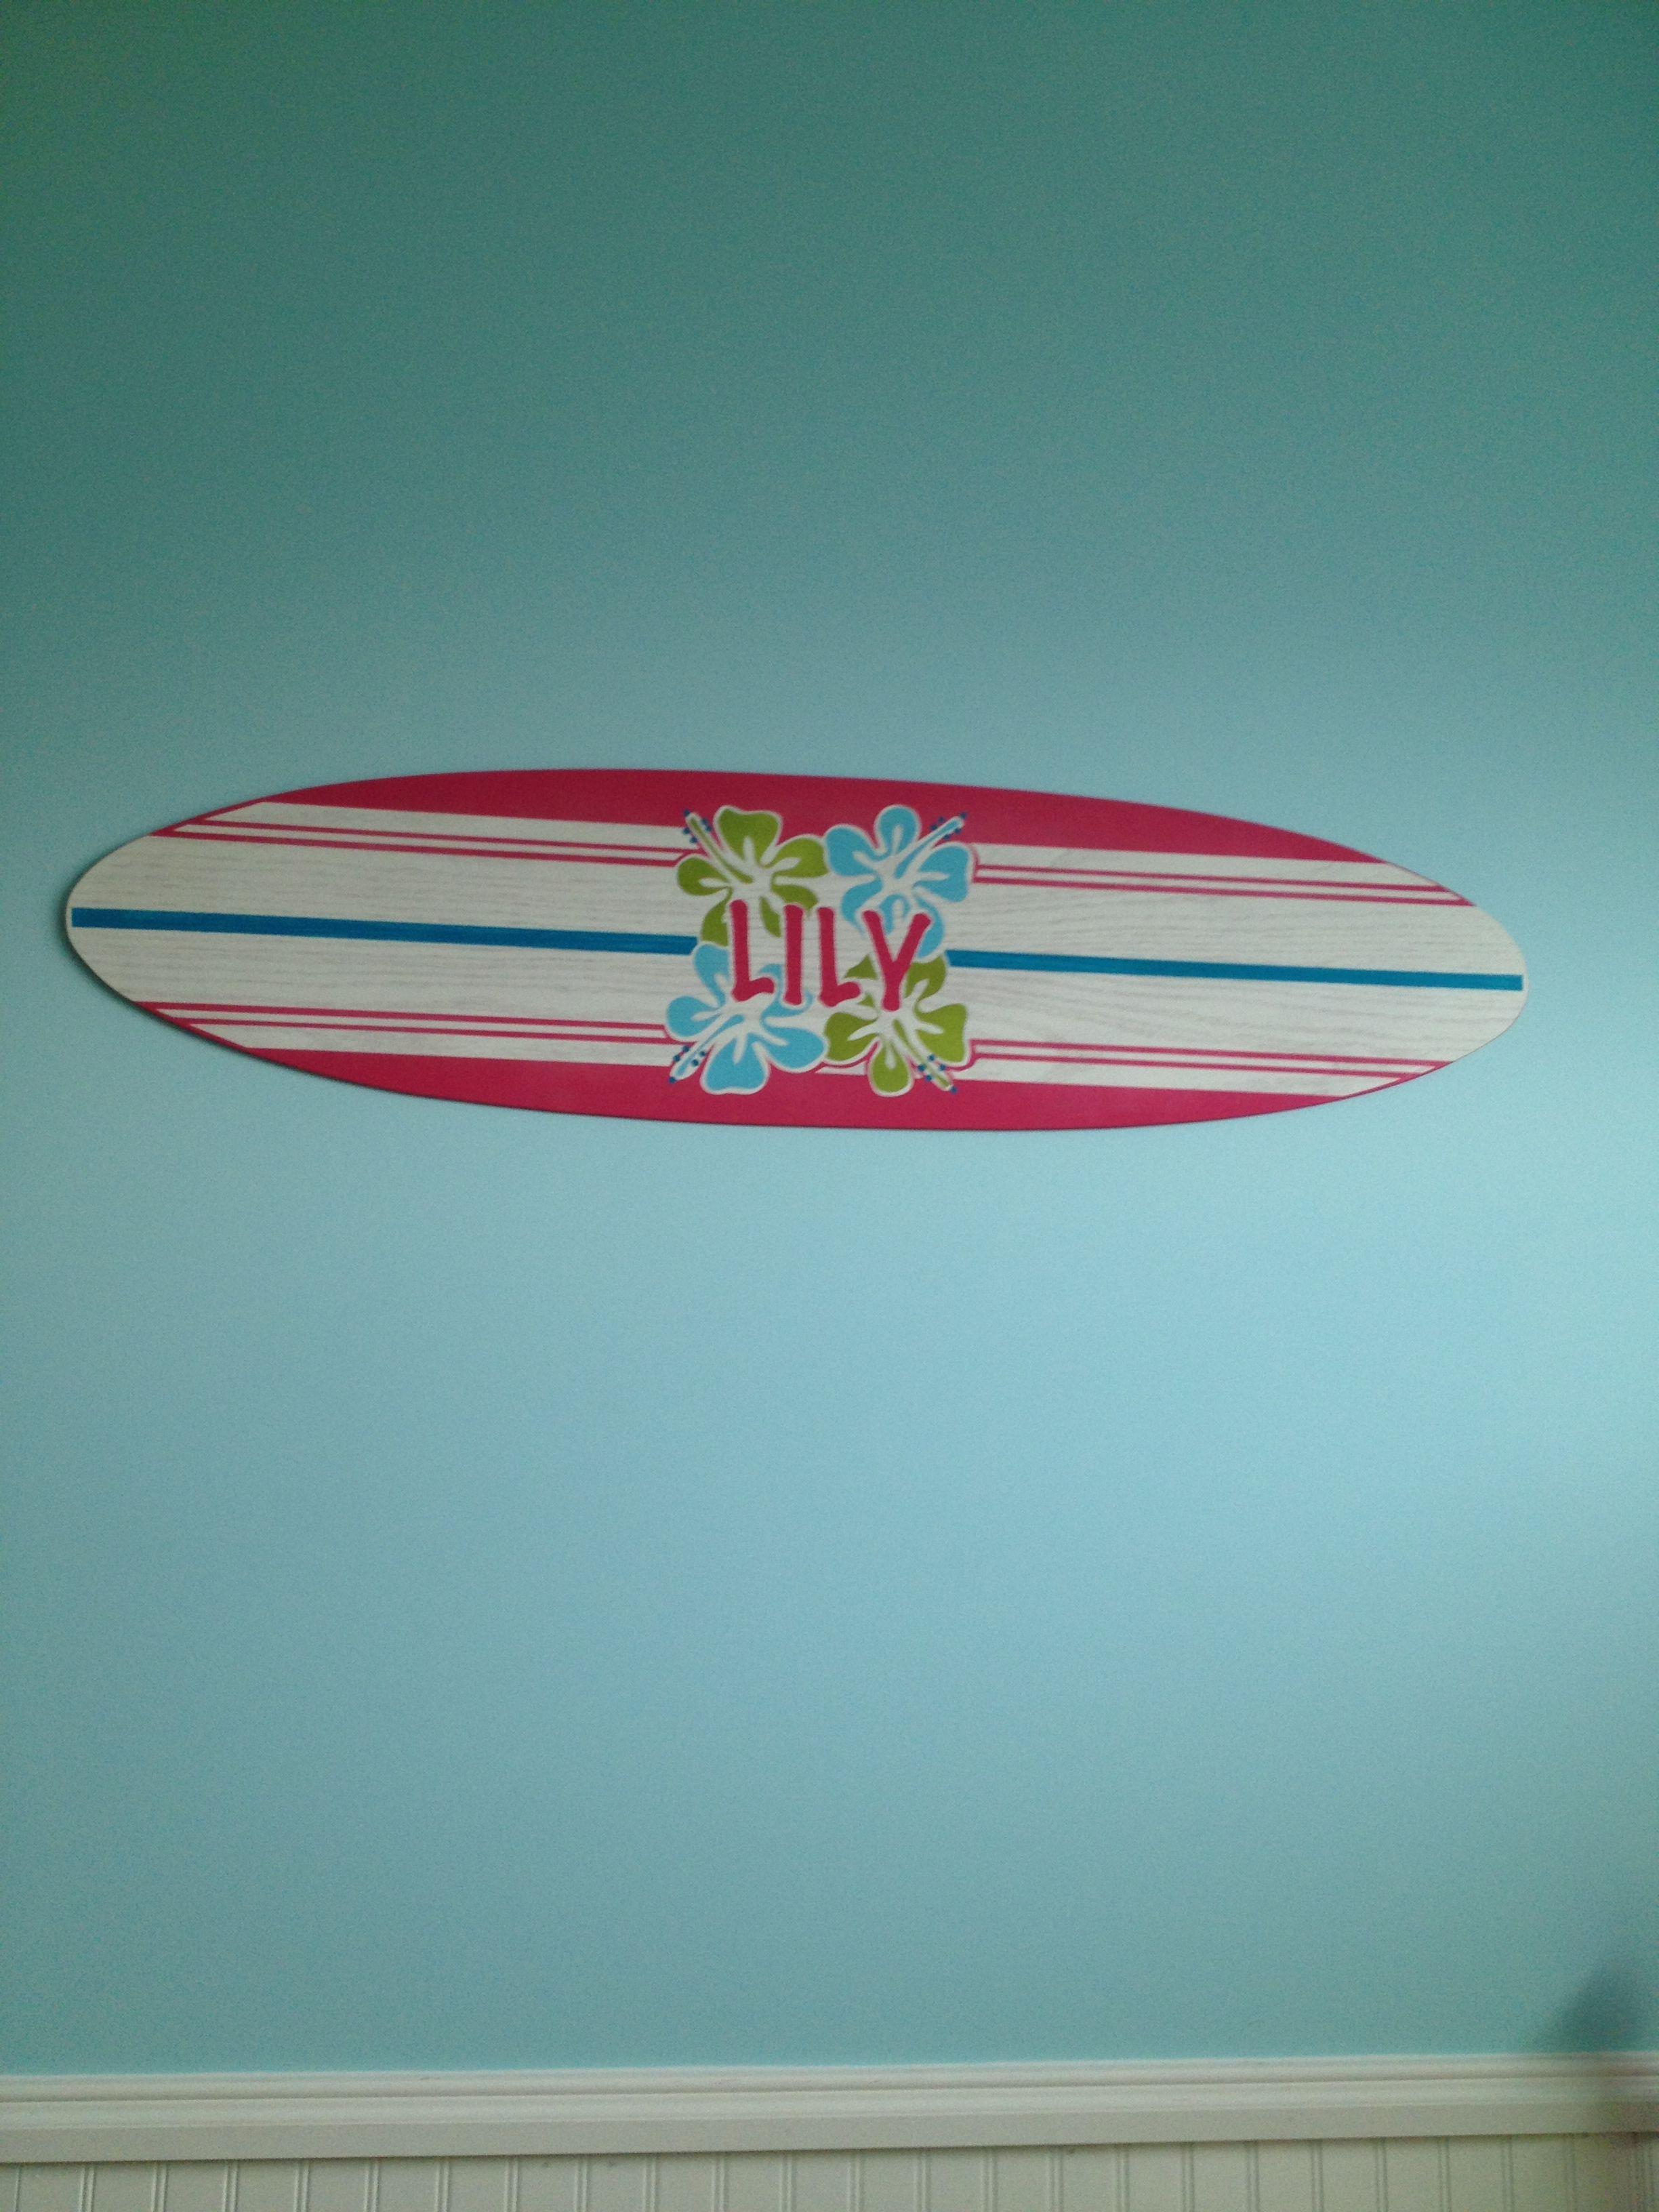 surfer girl bedroom accents ideas for ashlyn 39 s room pinterest